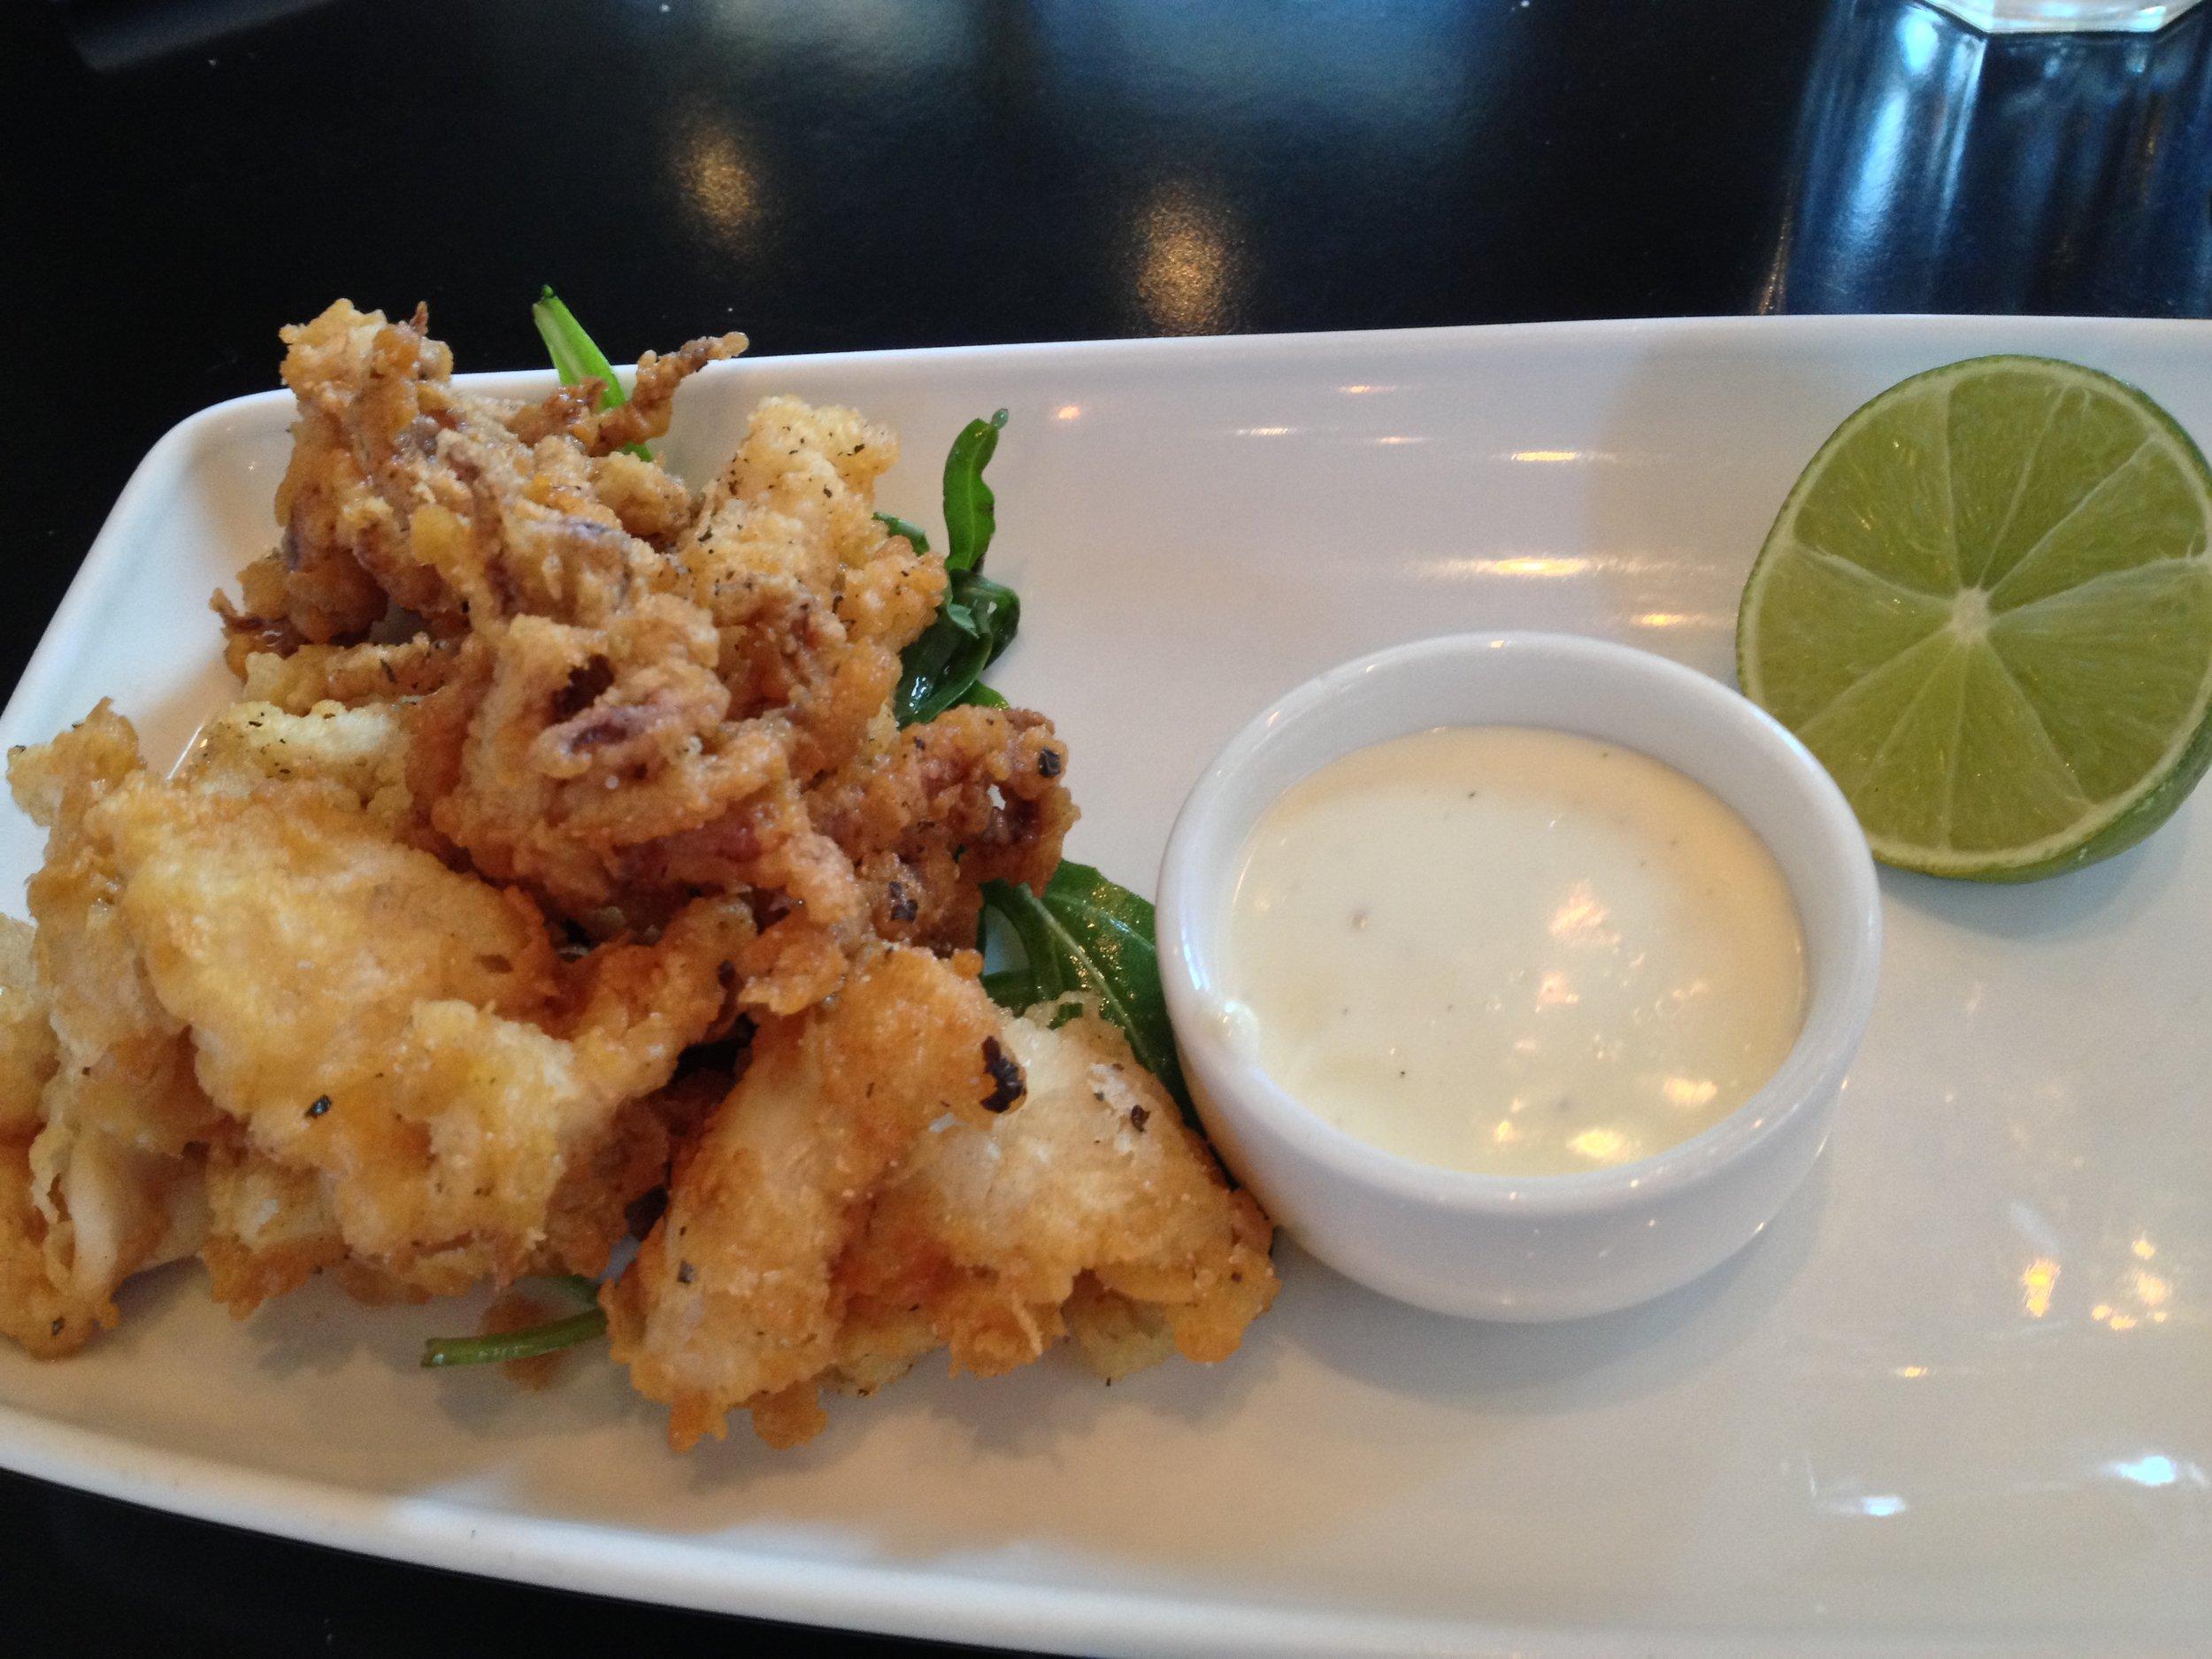 Crispy calamari with lemon mayonnaise